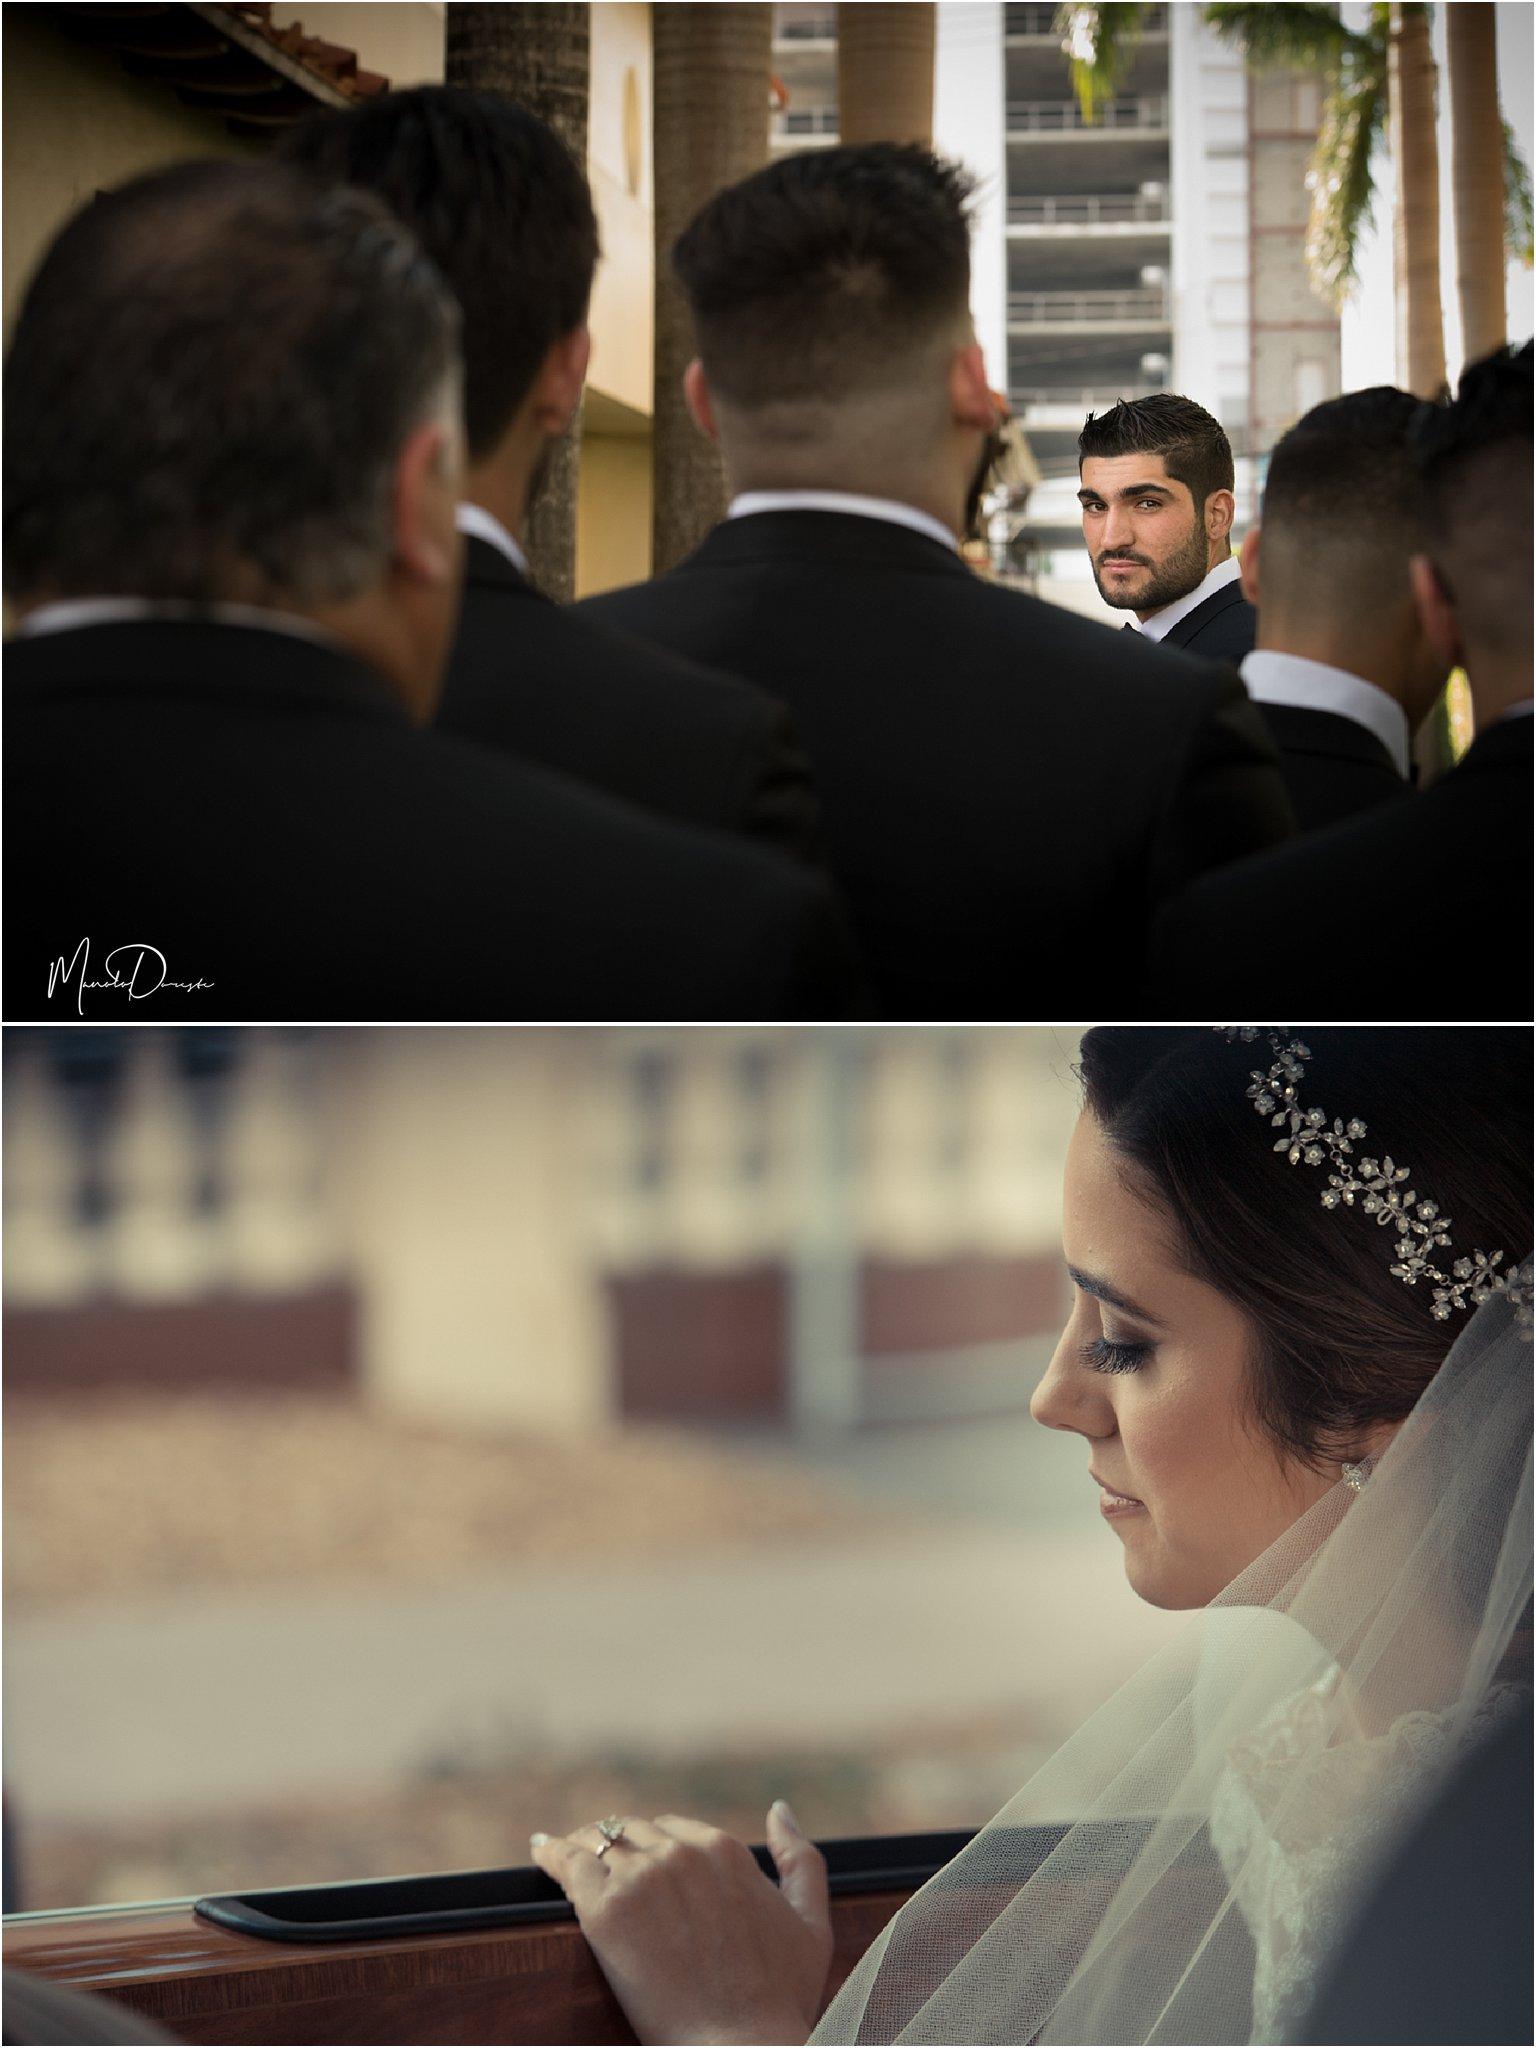 00935_ManoloDoreste_InFocusStudios_Wedding_Family_Photography_Miami_MiamiPhotographer.jpg